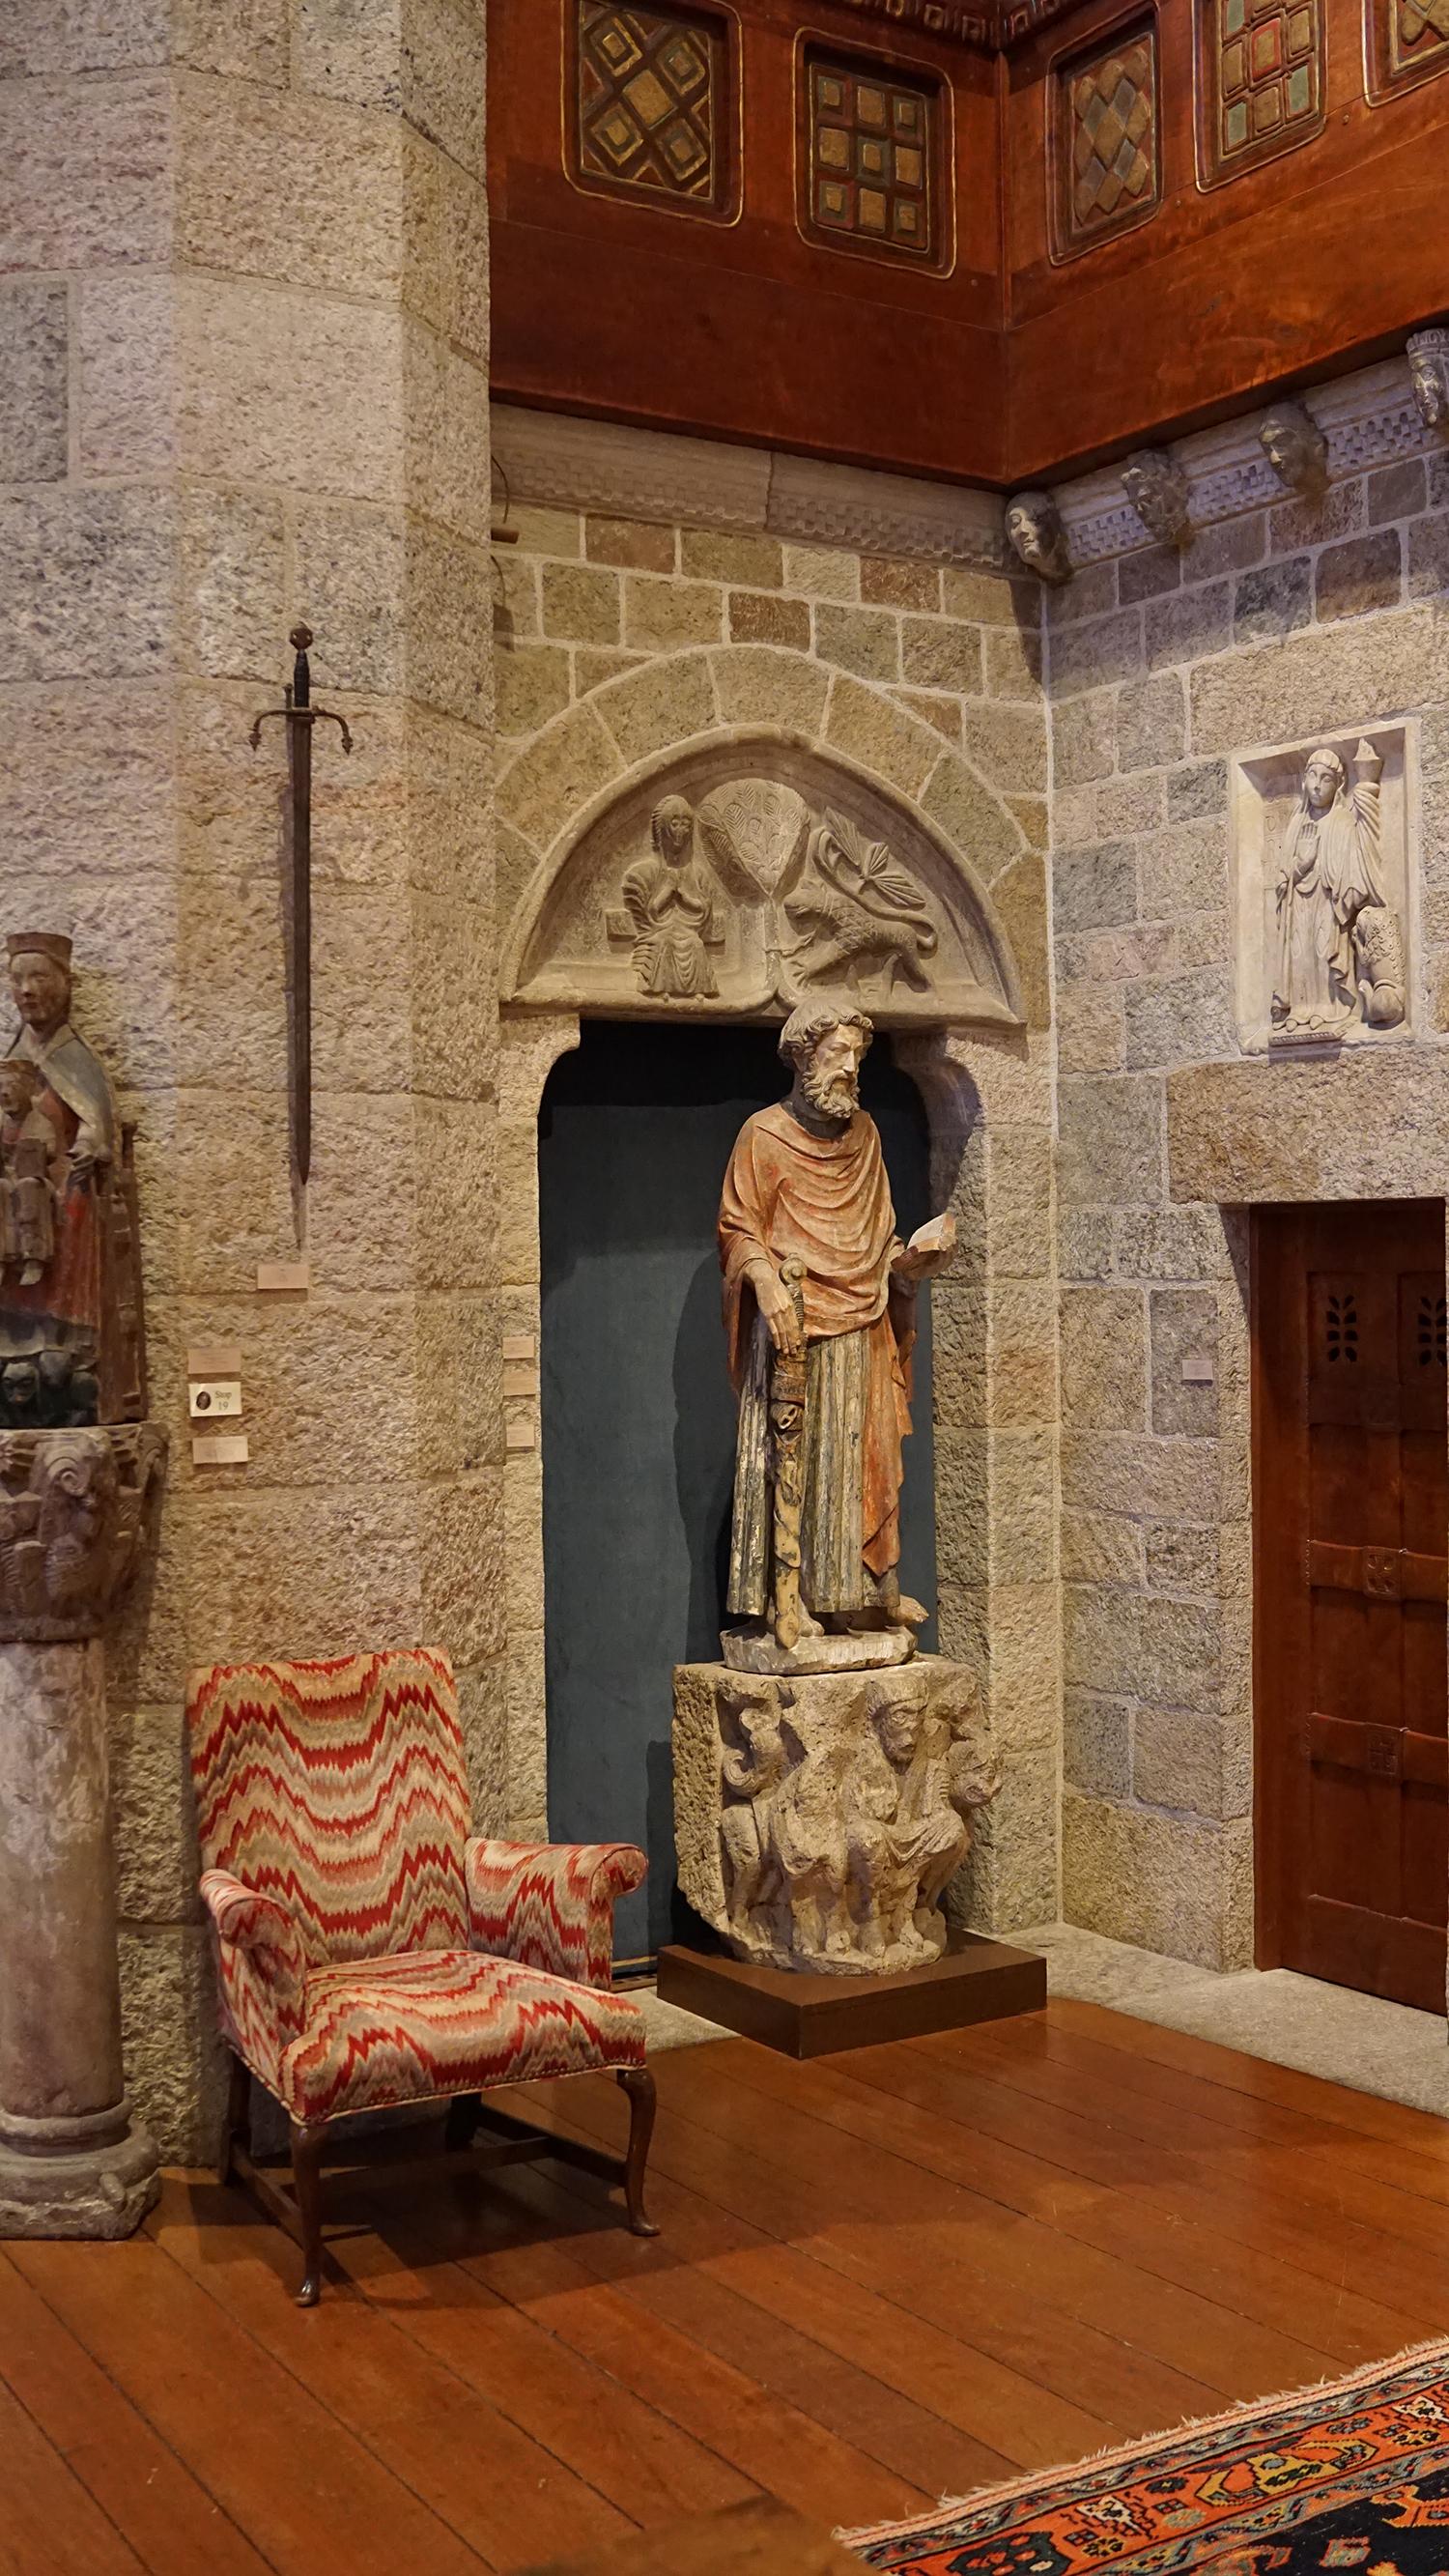 Figure 15: St. Paul conglomeration, Great Hall, Glencairn Museum, Bryn Athyn, Pennsylvania. Photo: Glencairn Museum.